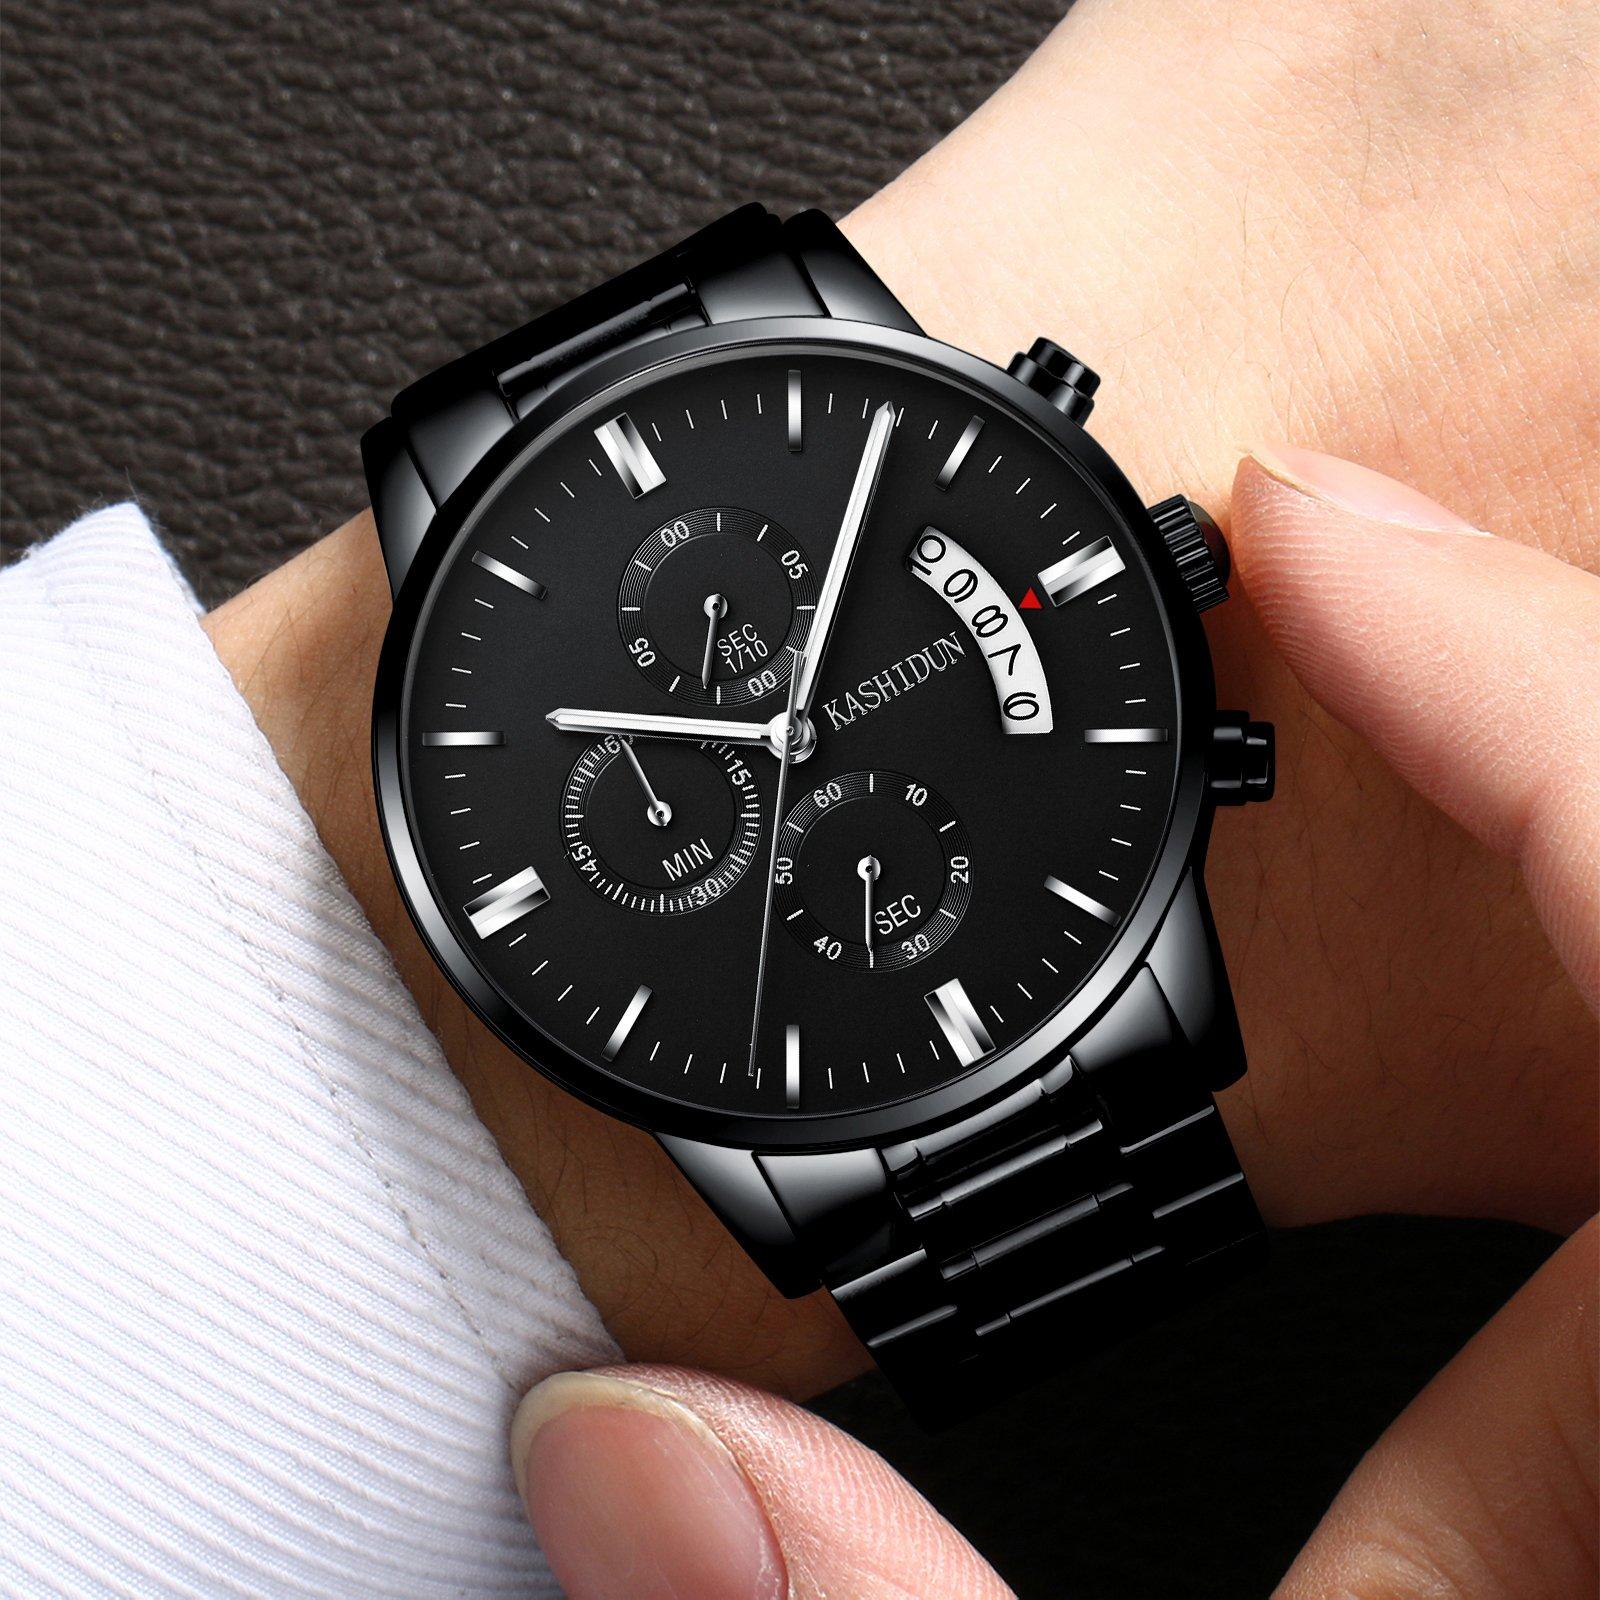 Mens Stainless Steel Watches Men Chronograph Waterproof Sport Date Quartz Wristwatch Classic Watch Black Color by KASHIDUN (Image #4)